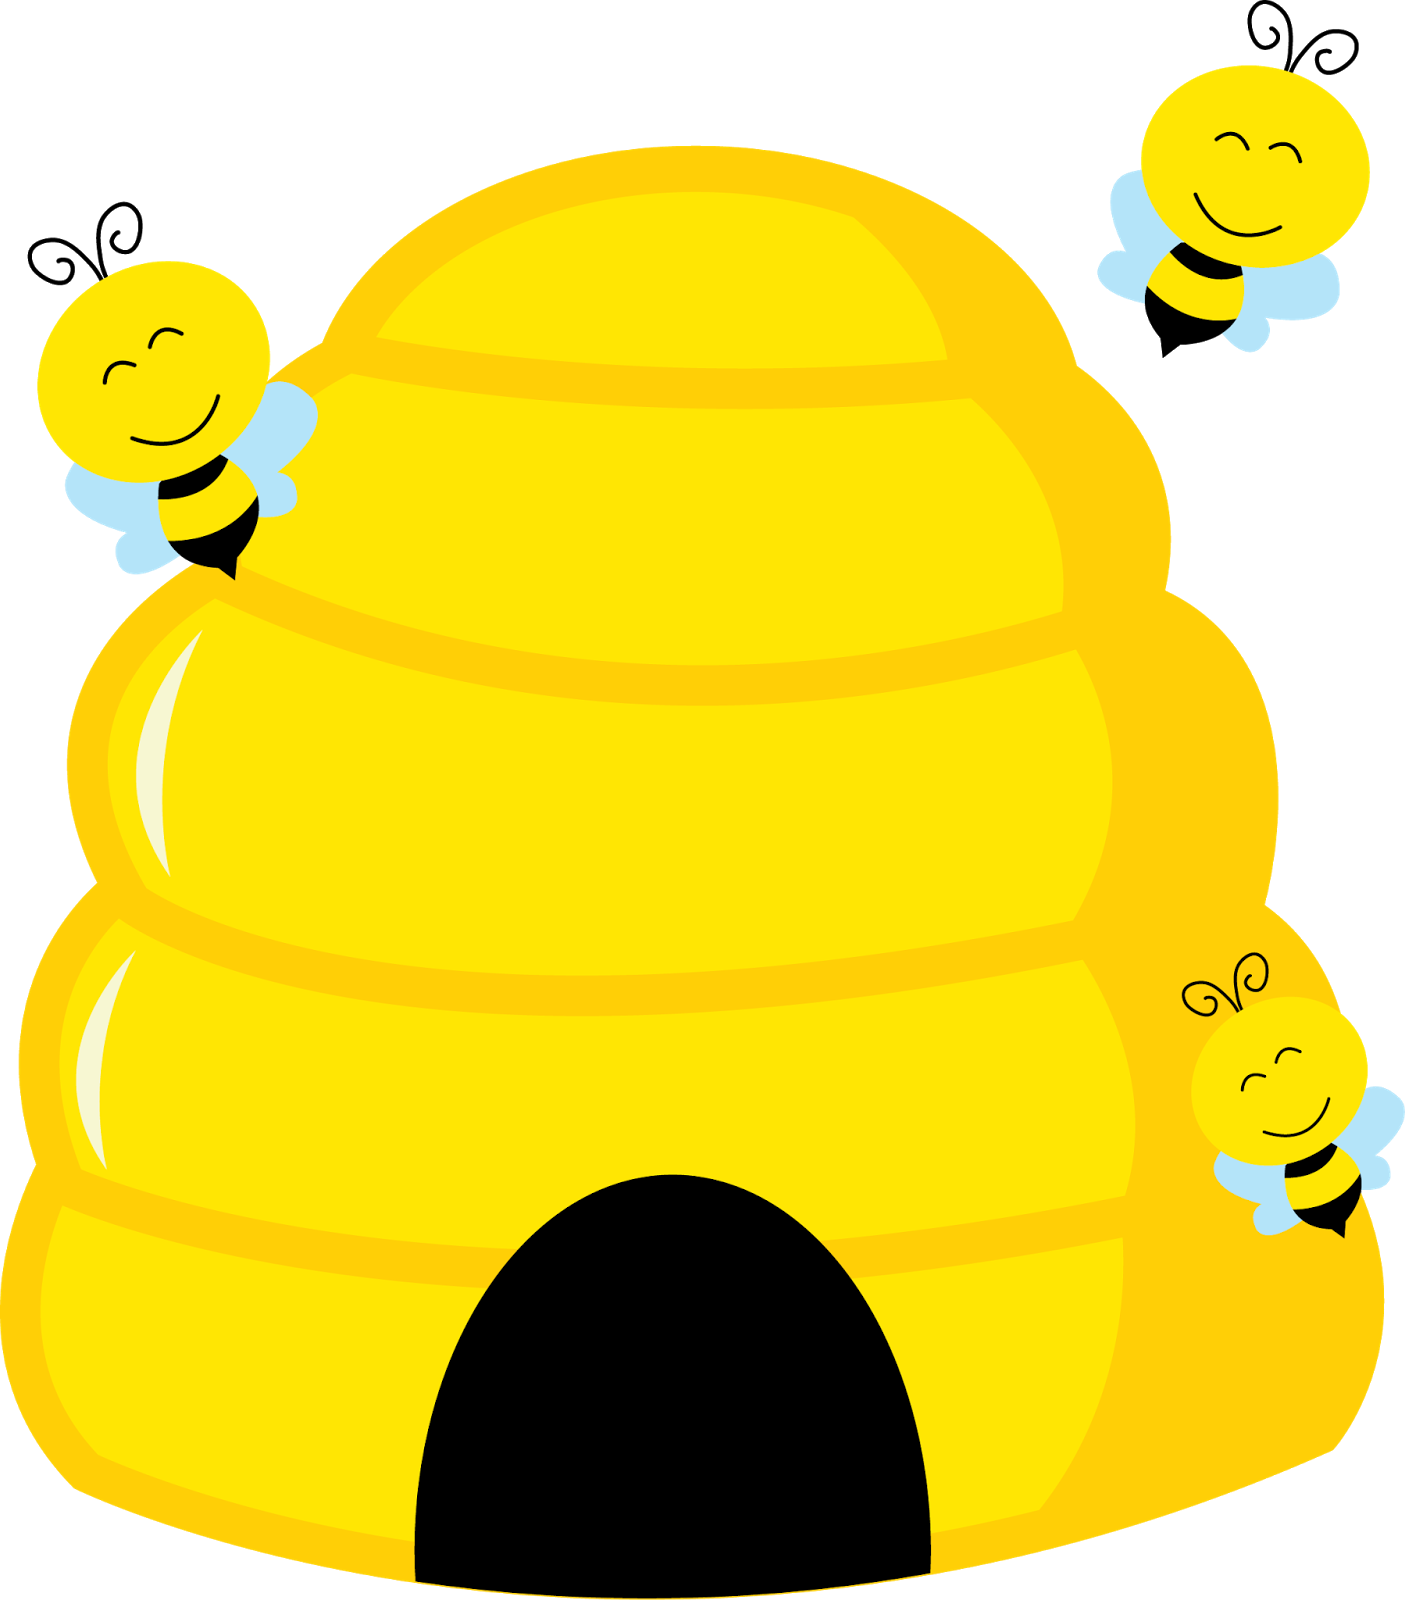 Honeycomb clipart bee pollination. Abelhinha png pinterest